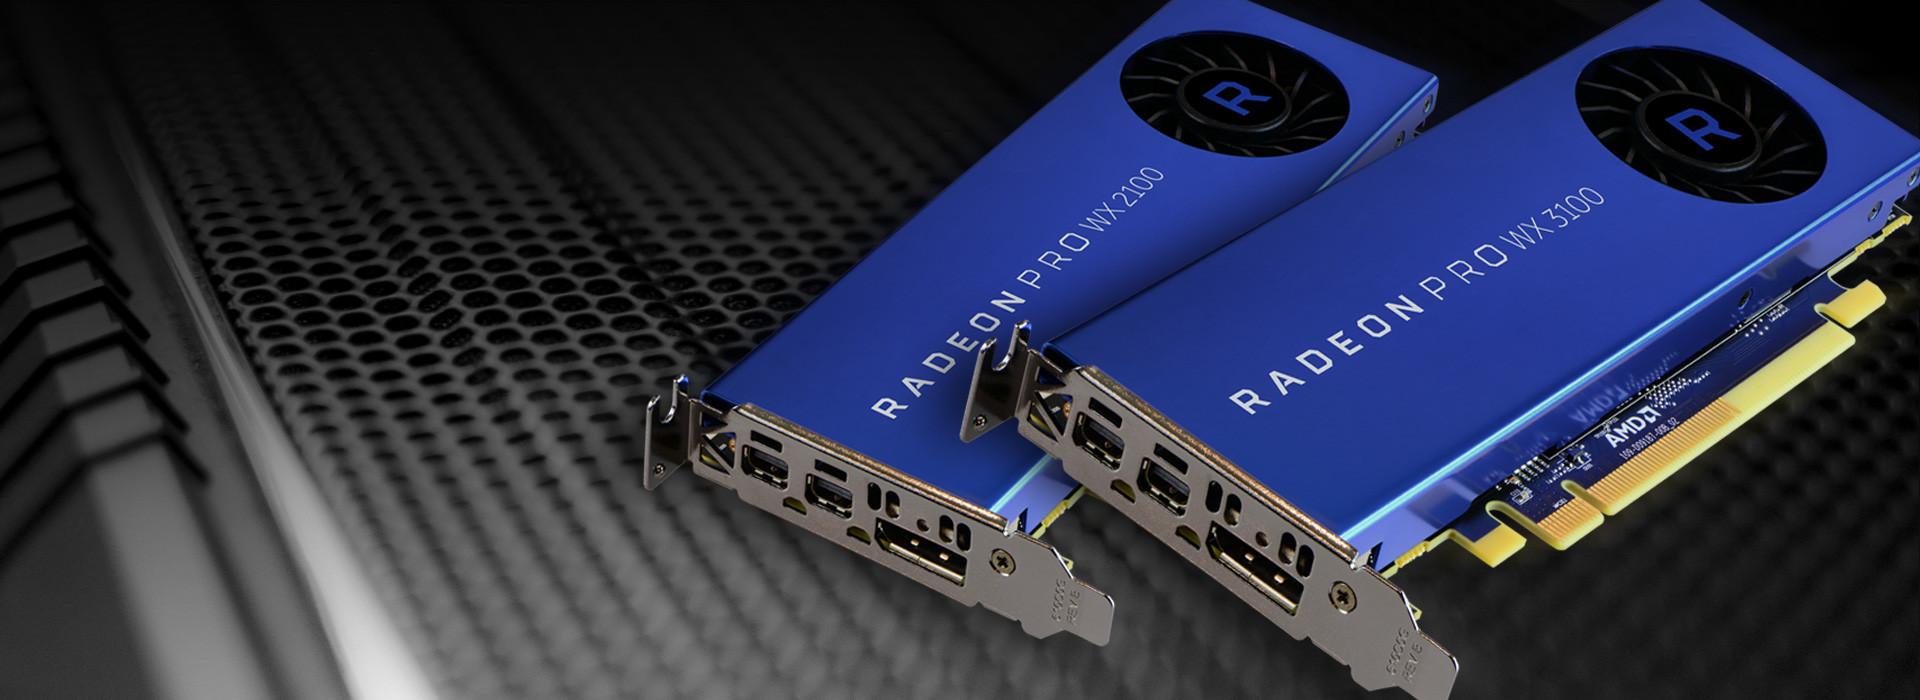 AMD Radeon Pro WX 2100 y WX 3100 para Workstations